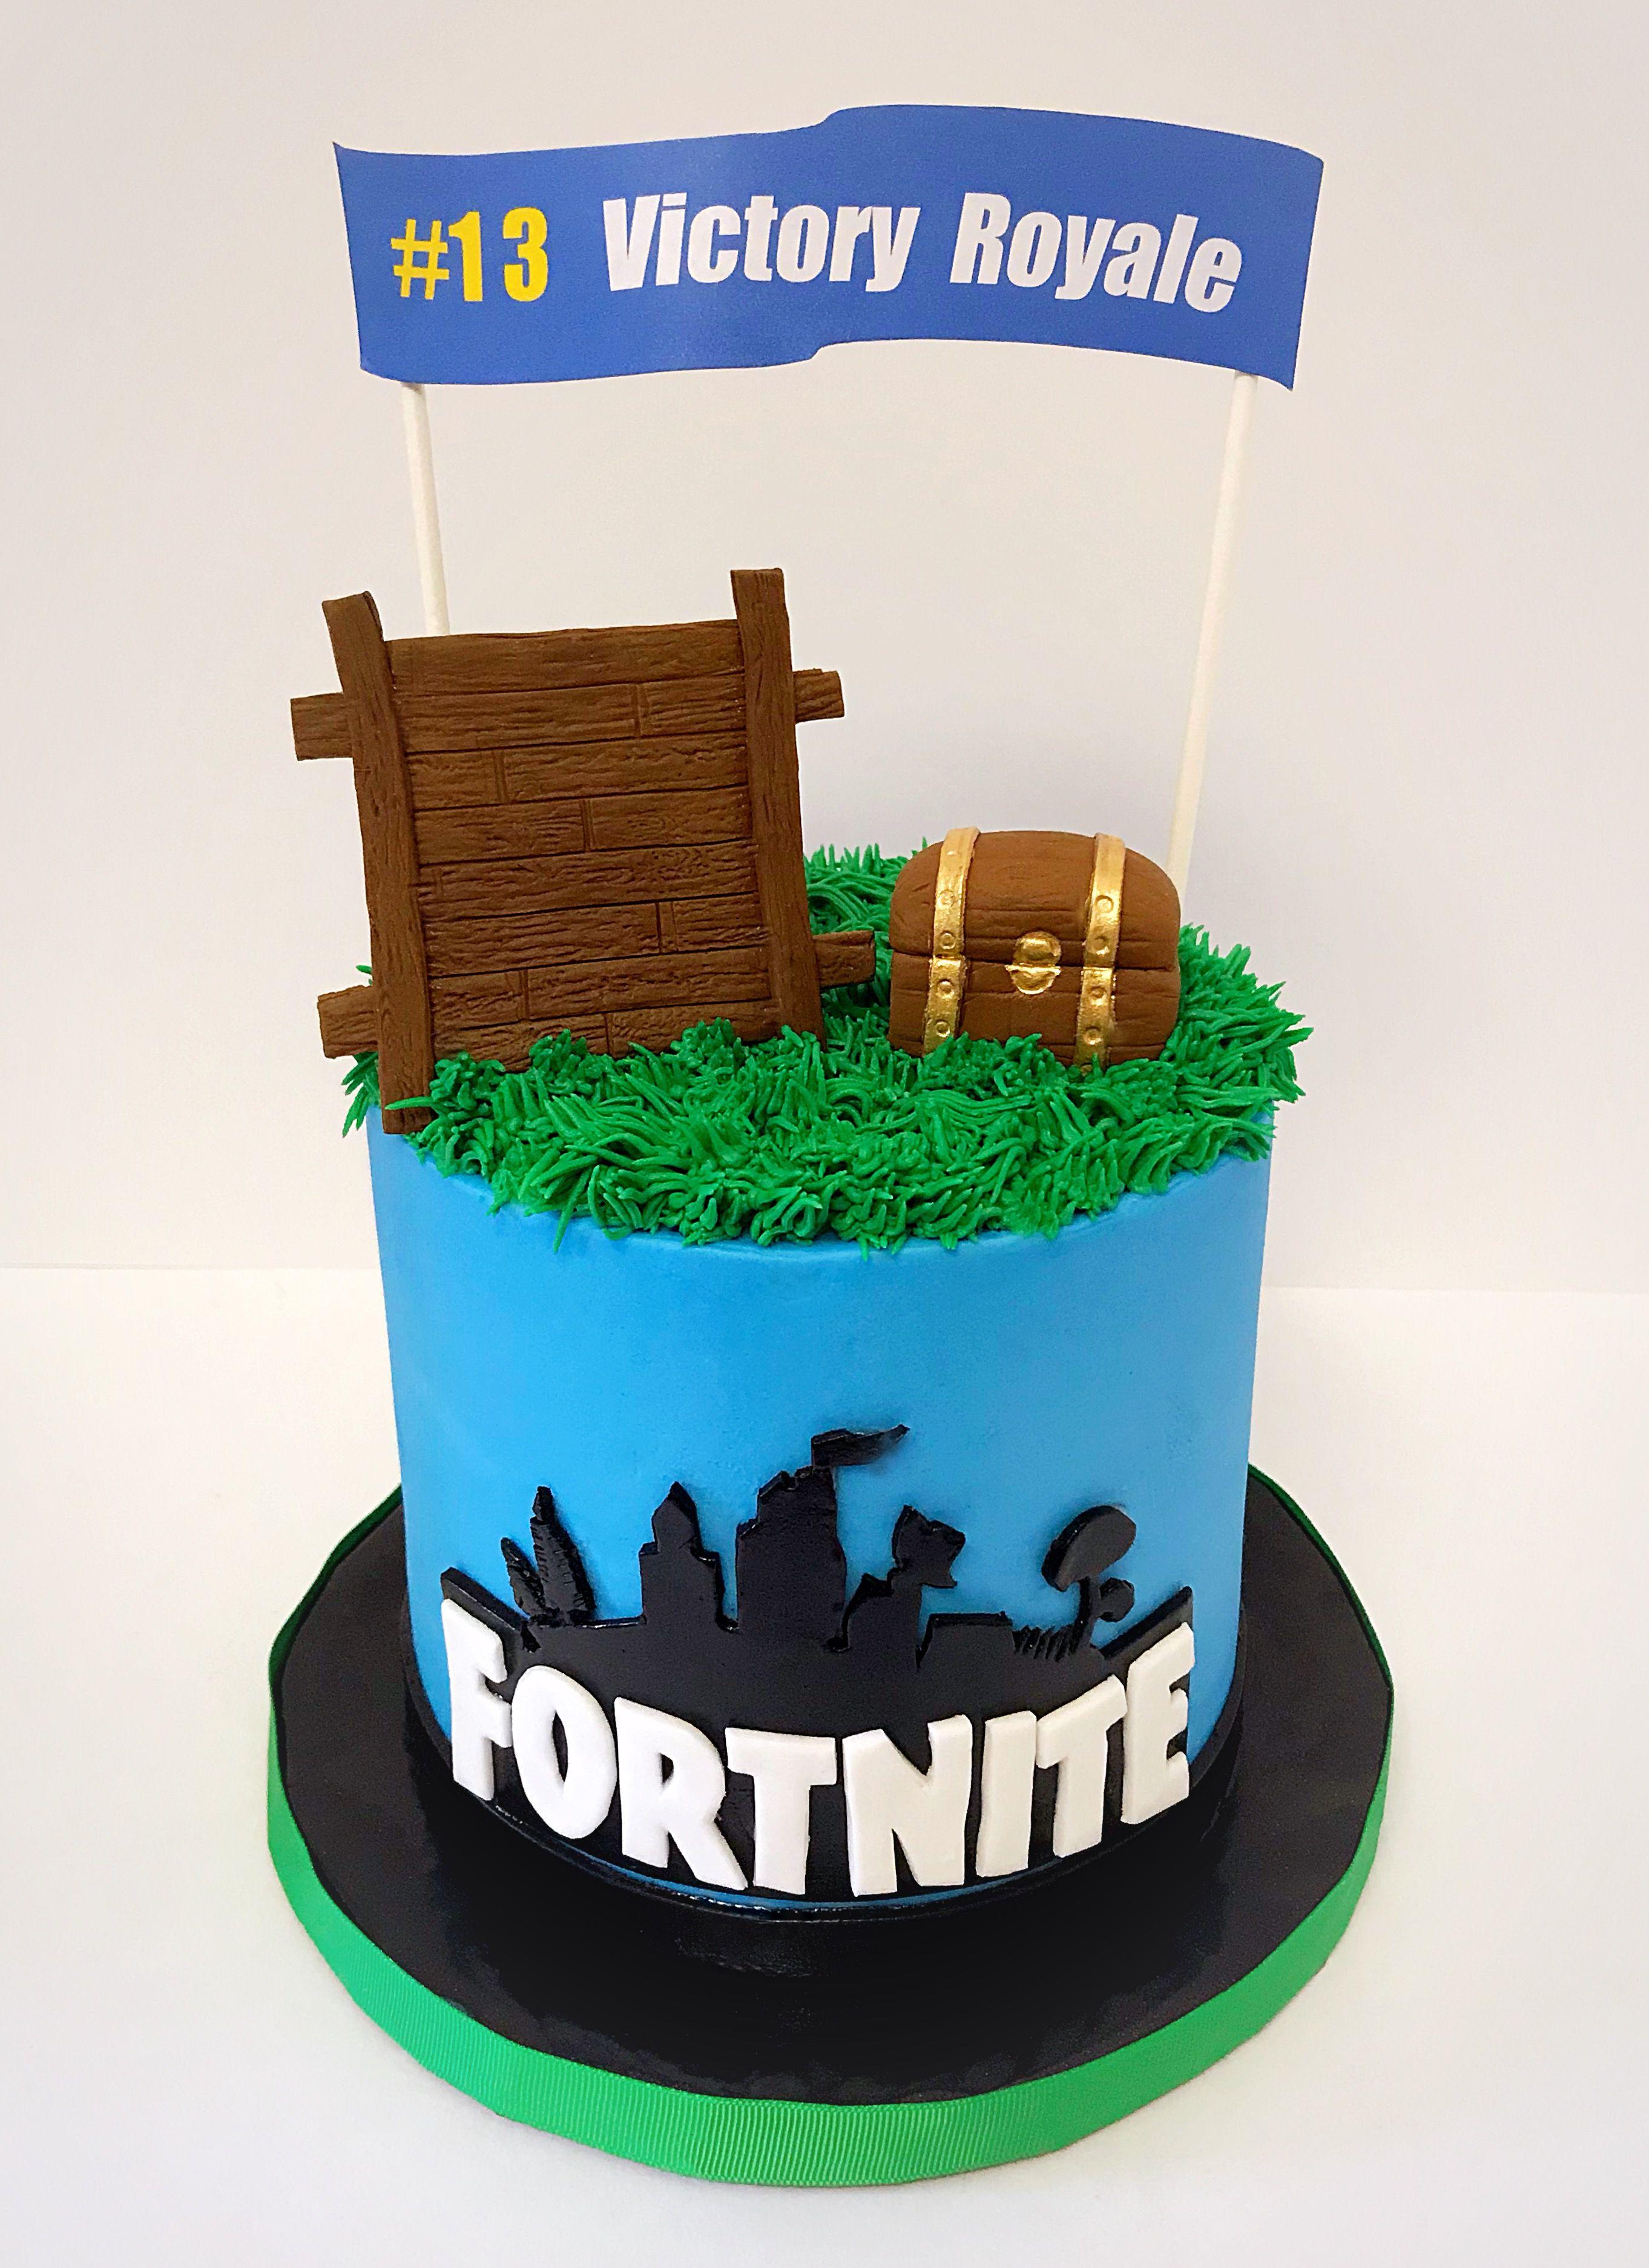 Fortnite Cake Sweet Lia S Cakes Amp Treats In 2019 13